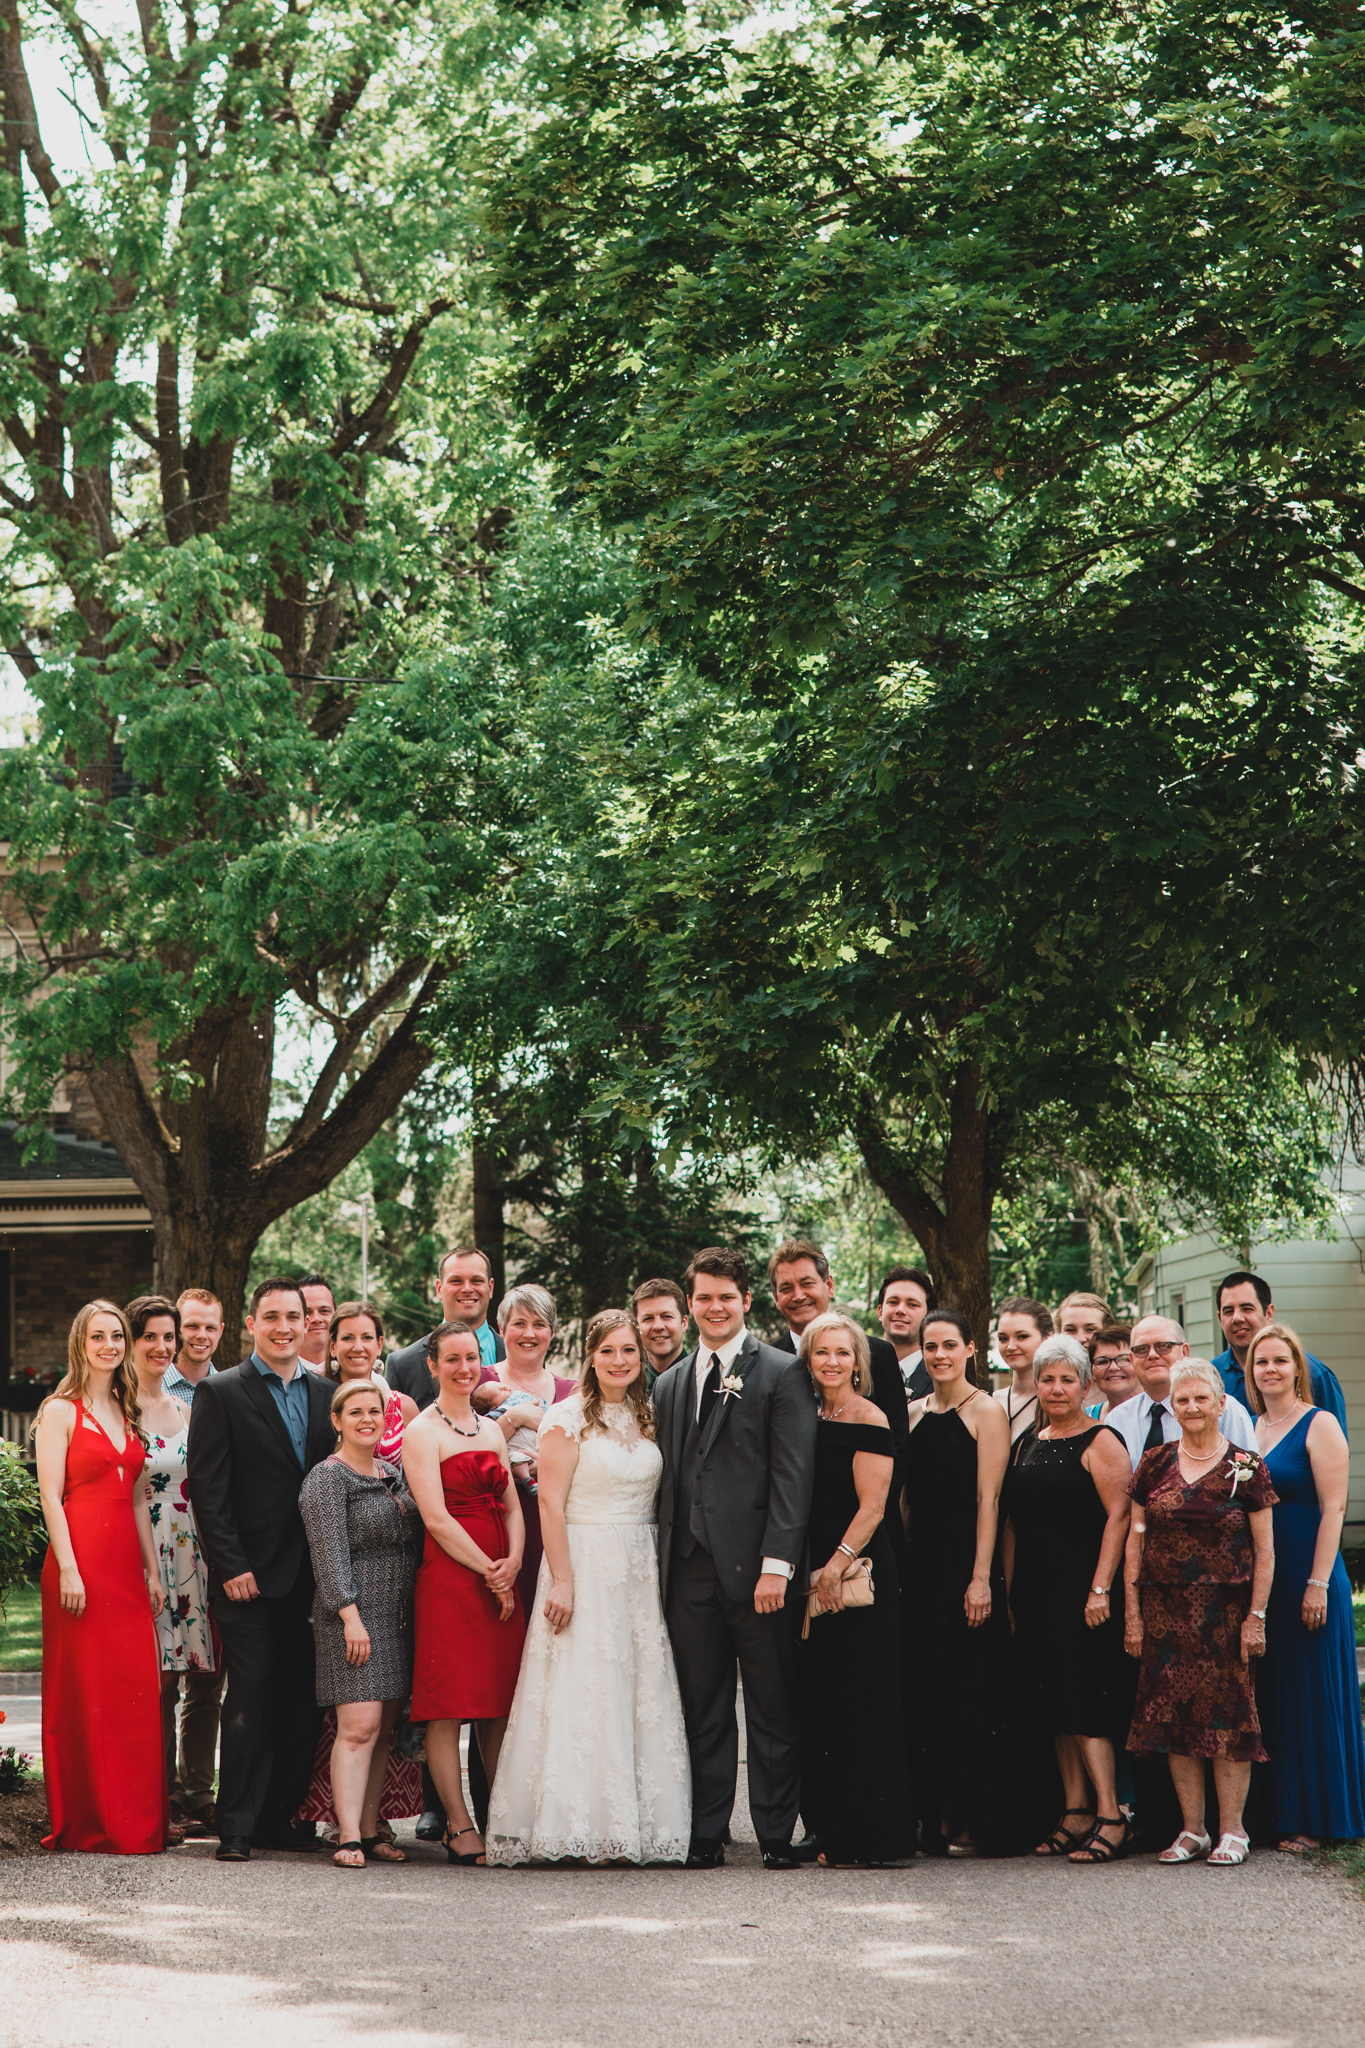 412-WEB-Jonathan-Kuhn-Photography-BenHayley-Wedding-4596.jpg